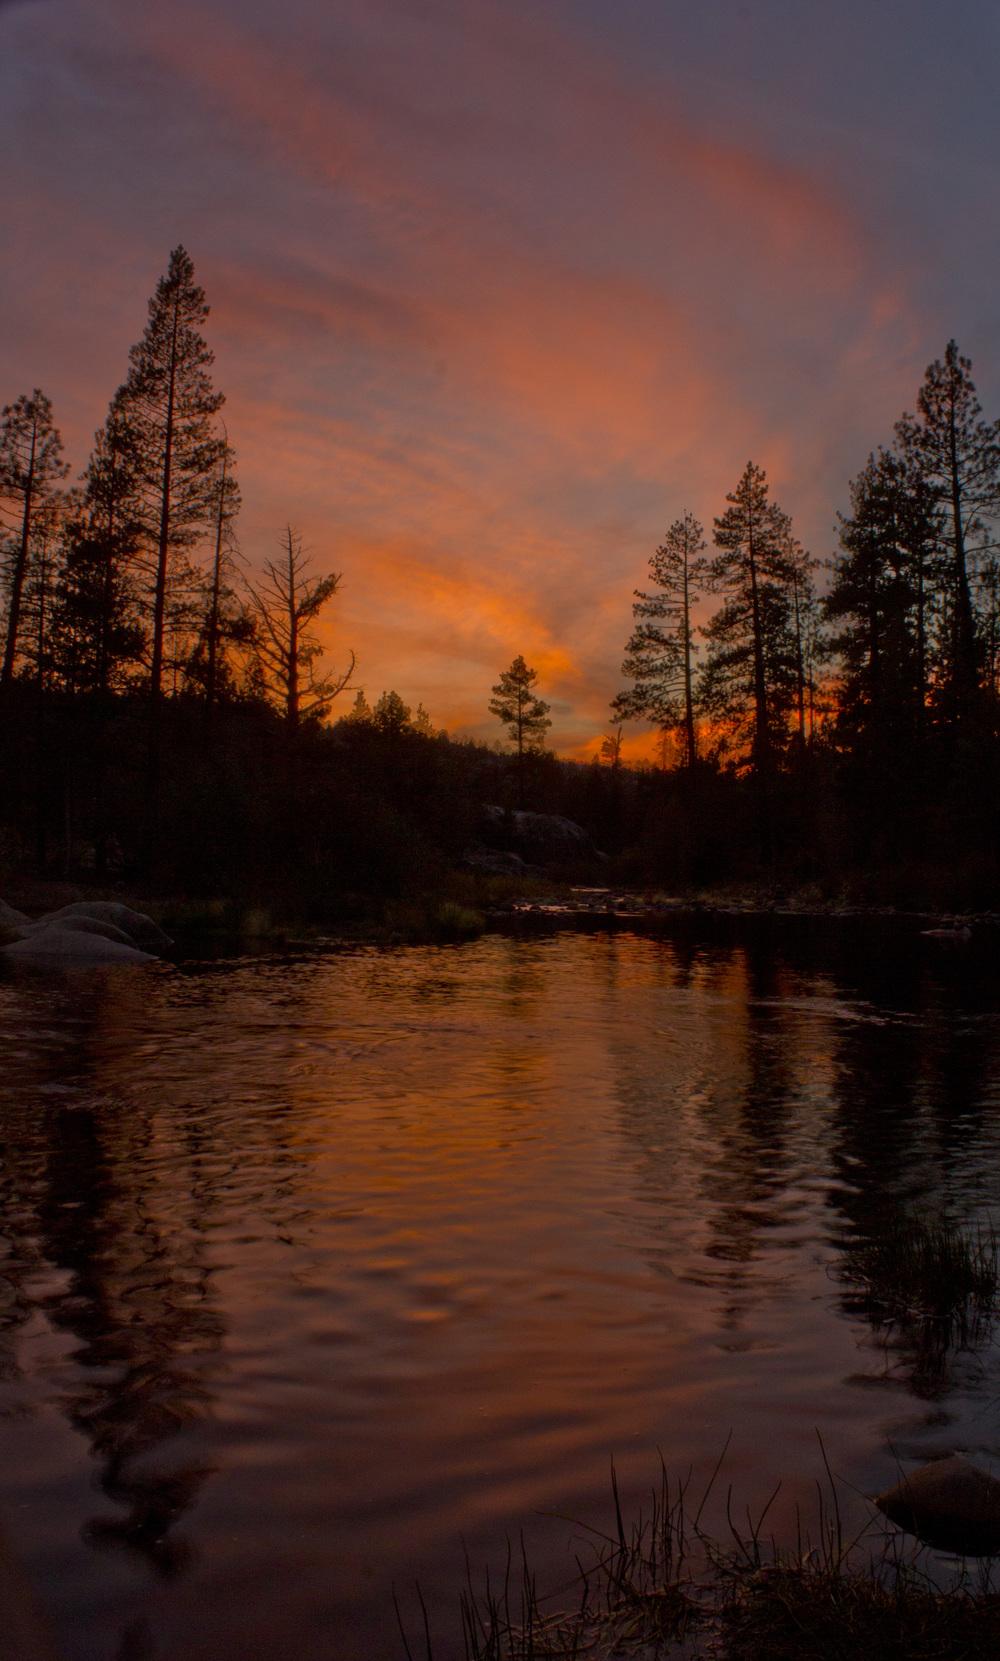 Mono_Sunset_2015.jpg